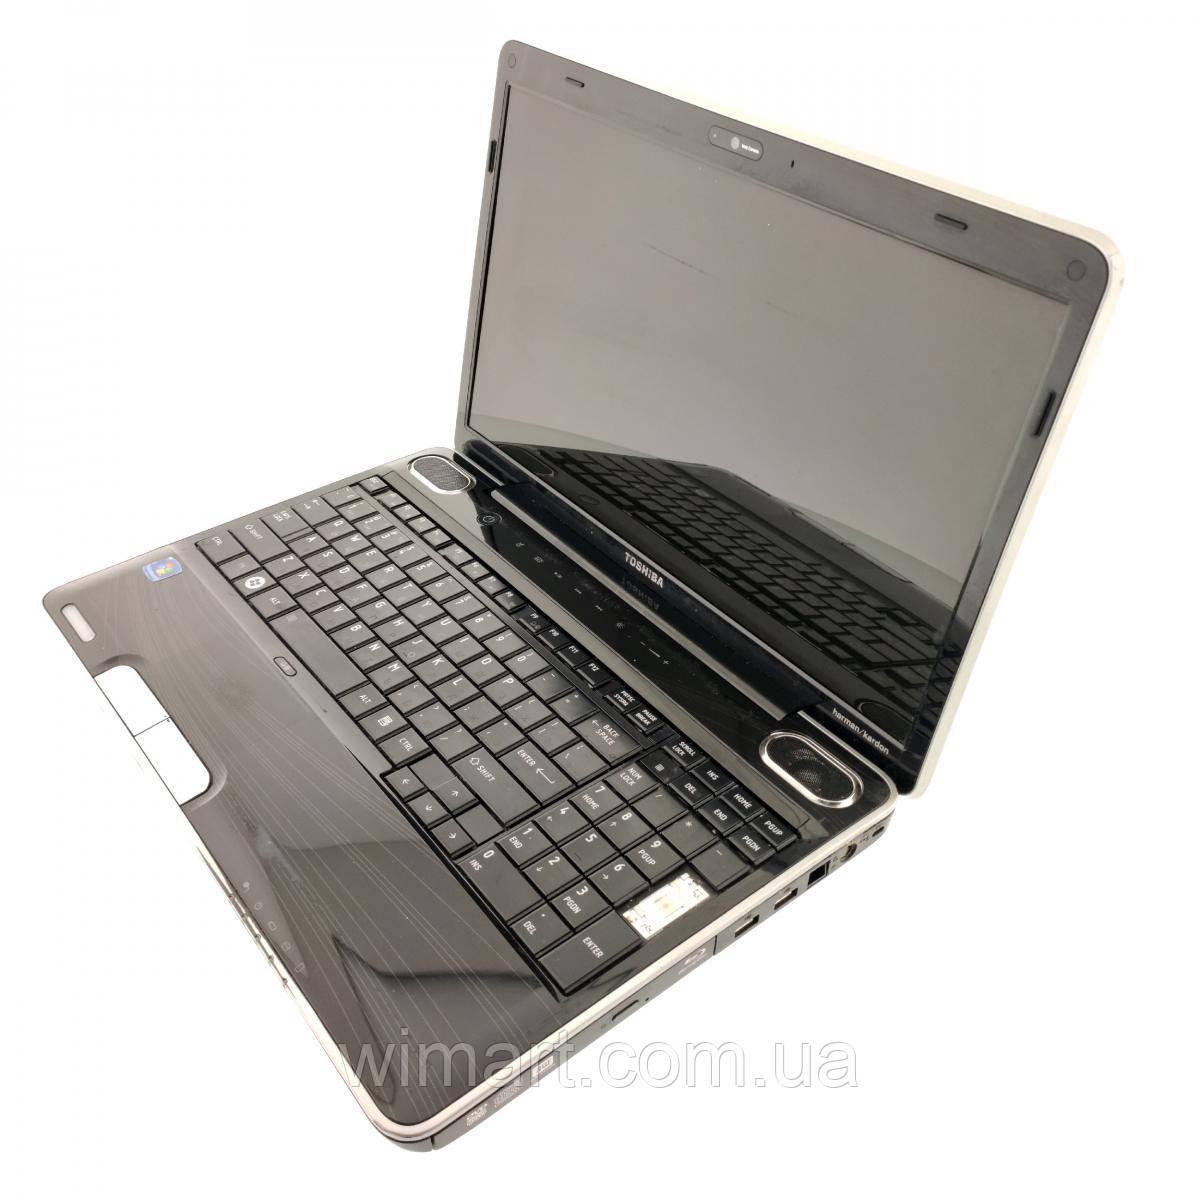 "Б/У Ноутбук Toshiba Satellite A505-S6014 15.6"" Intel i5-430m 2GB DDR3 noHDD"